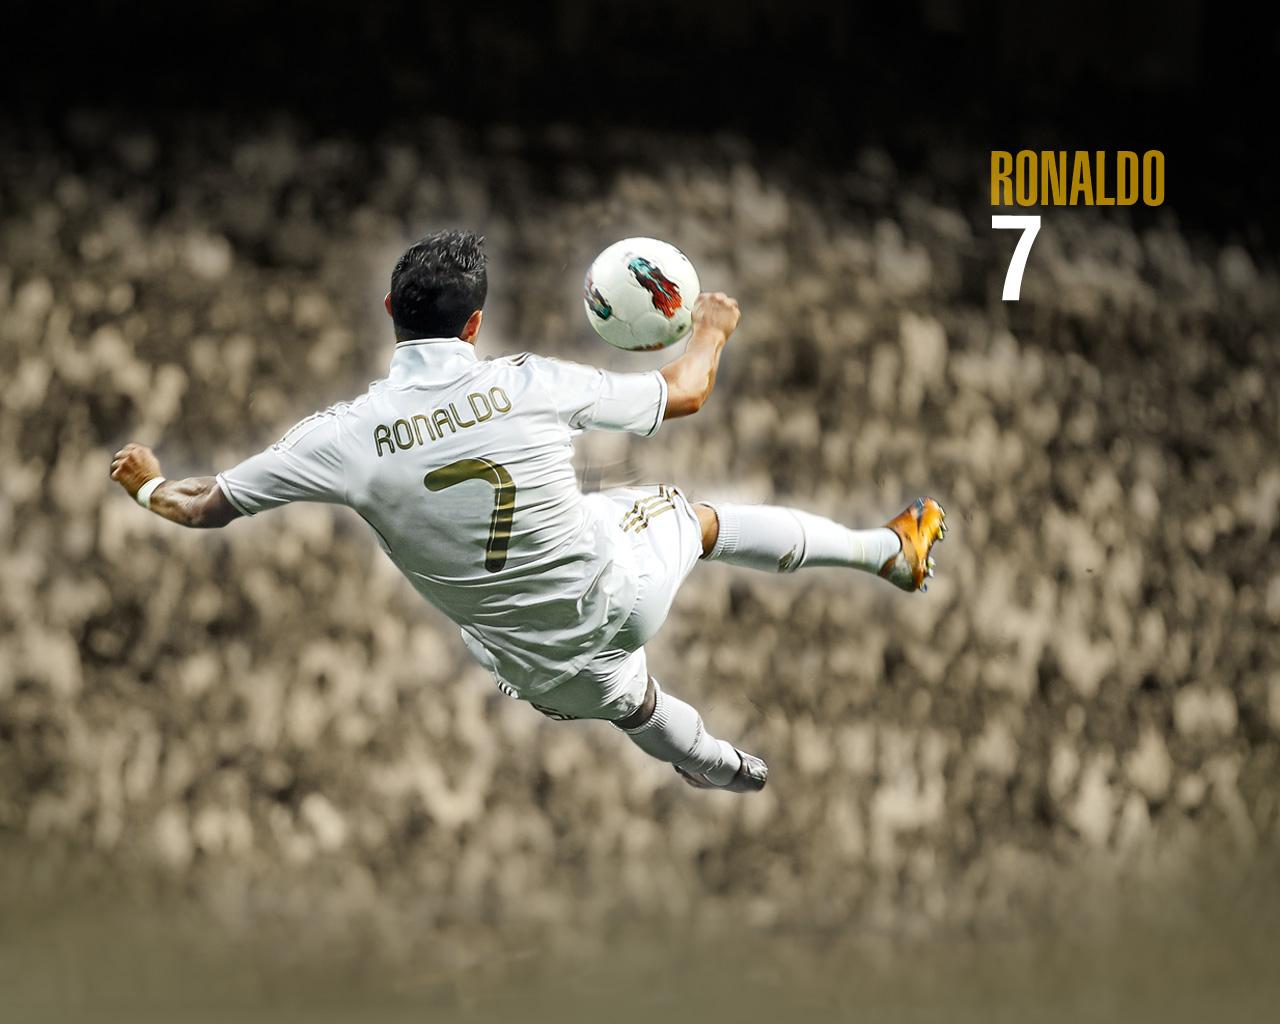 http://1.bp.blogspot.com/-uhB1DOJ7bSk/UDcXj1xn5DI/AAAAAAAAQSM/cXTmKqziVPo/s1600/Cristiano+Ronaldo+HD+Wallpapers+2012-2013+13.jpg